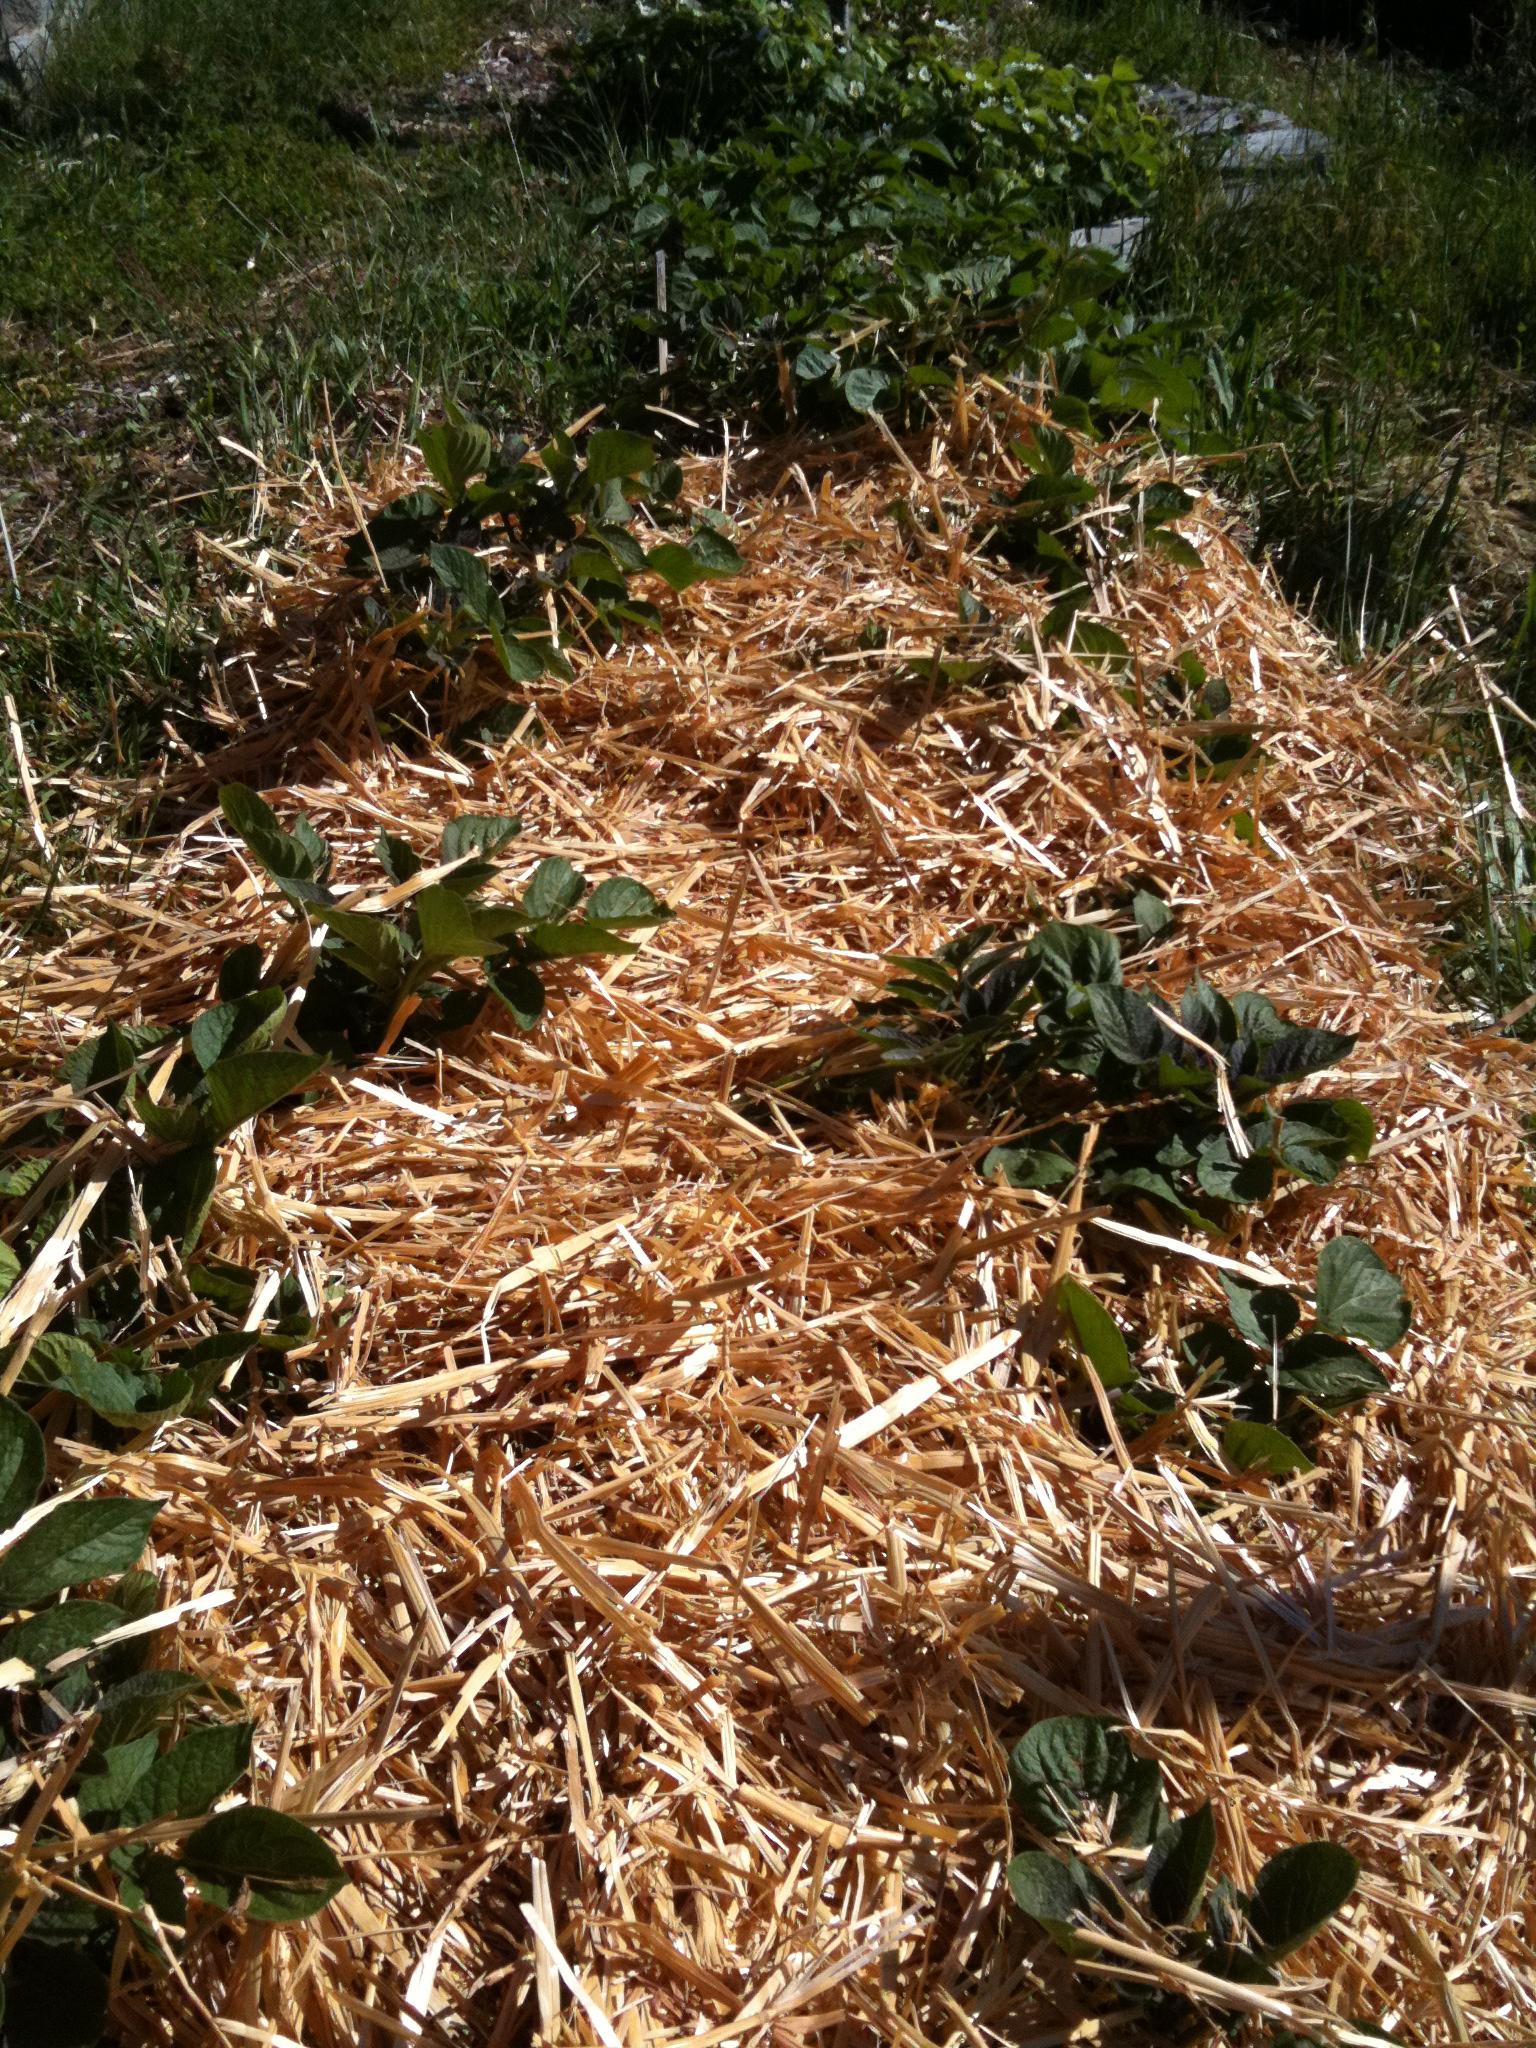 Growing Potatoes In Straw Bales Opt Out En Masse